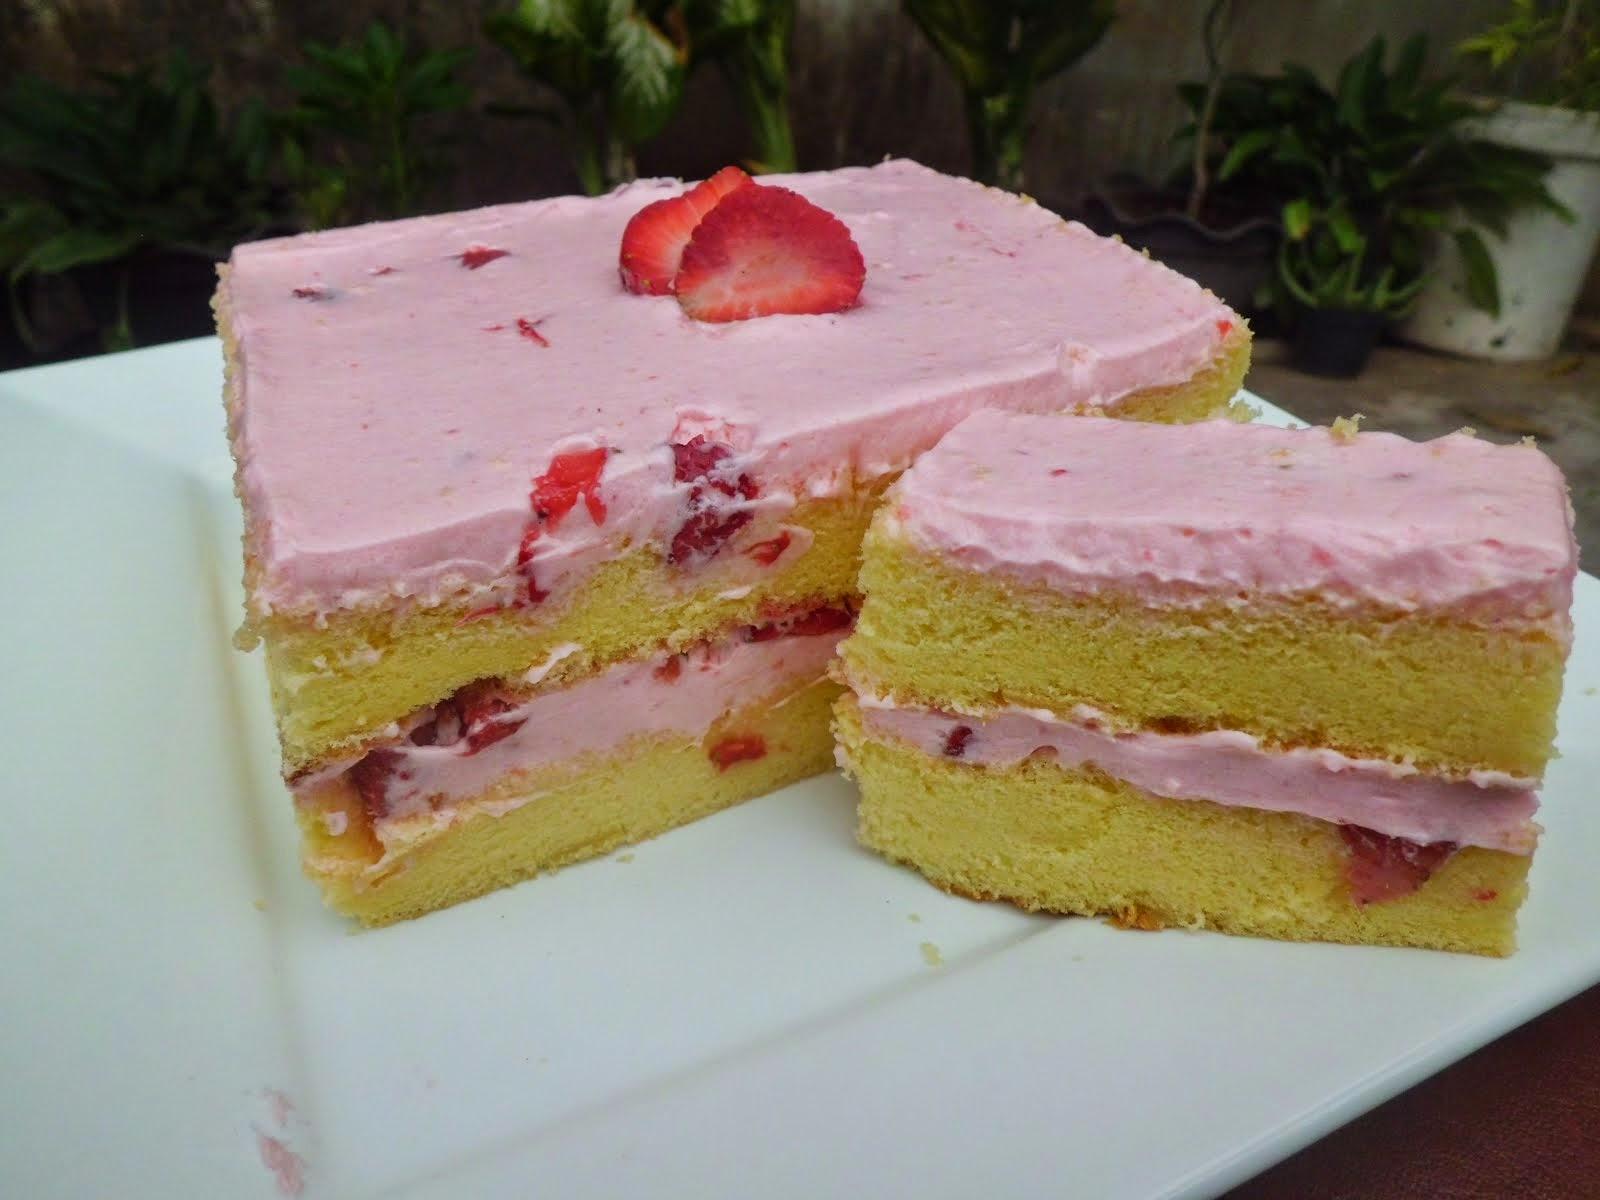 Strowbery Cake